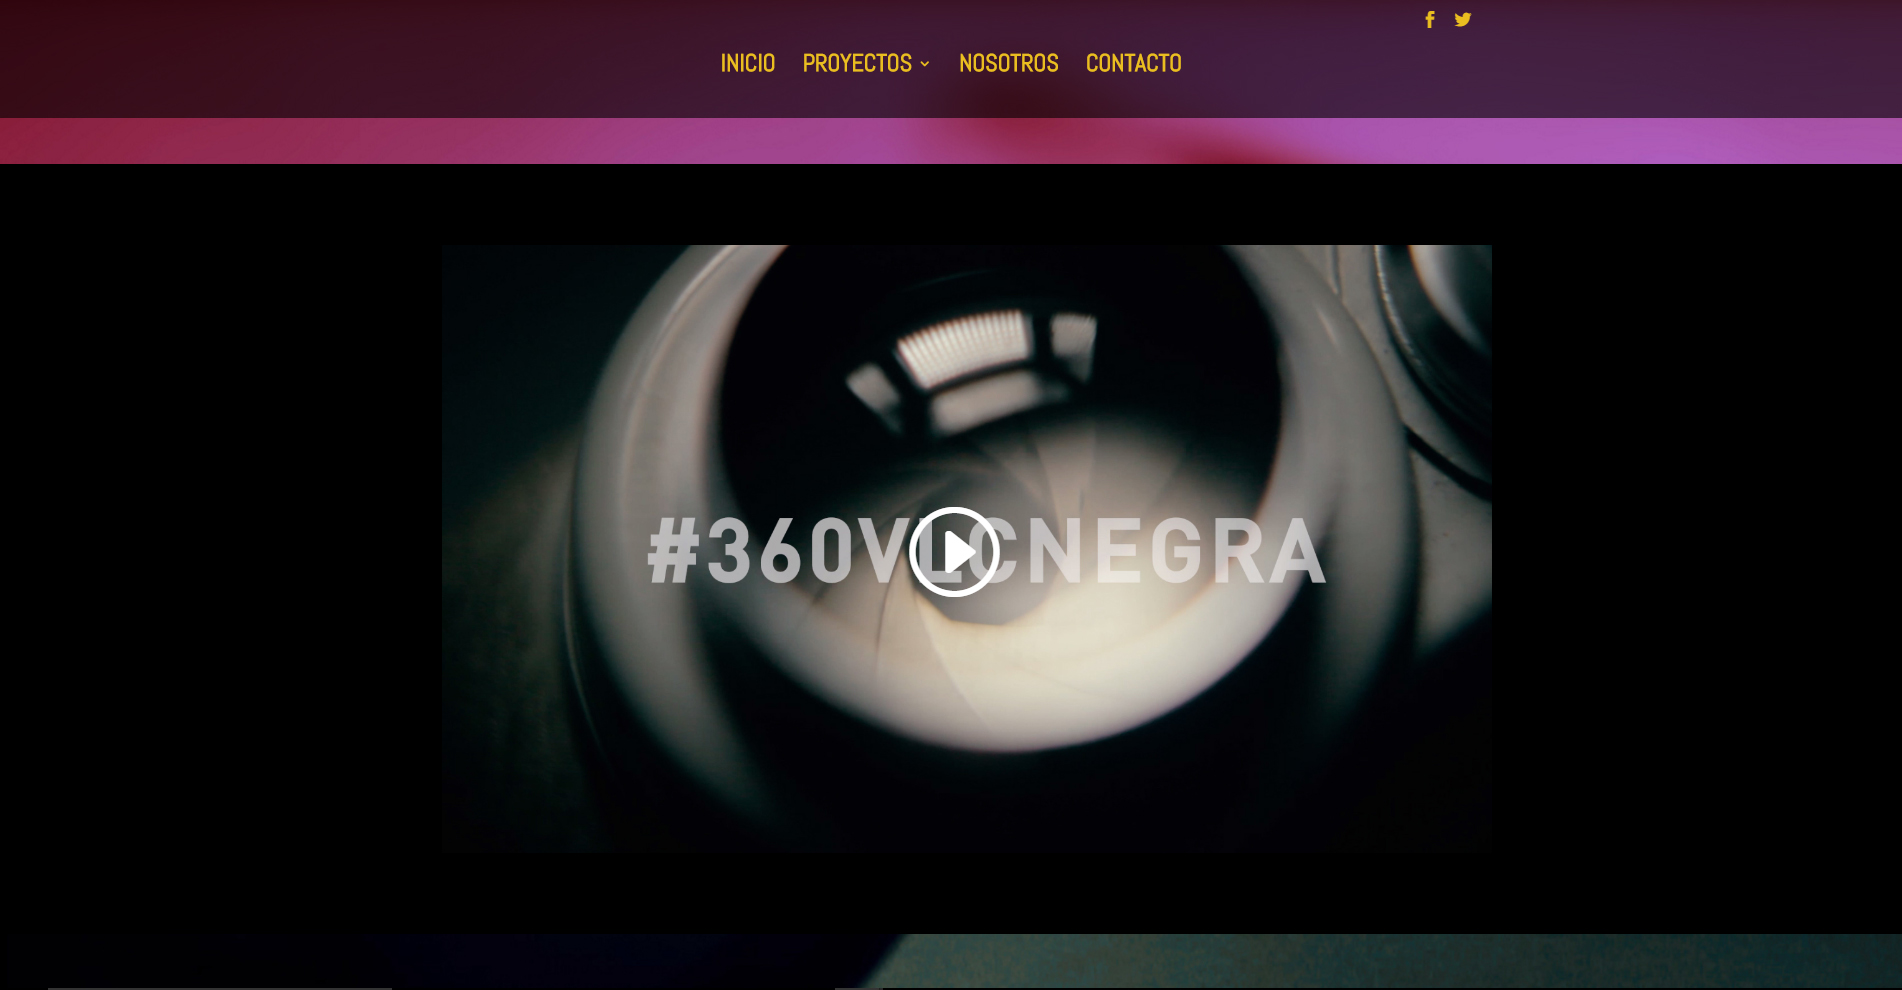 Tercera Planta Films - Web 360VLCNEGRA - Capturas de pantalla 5